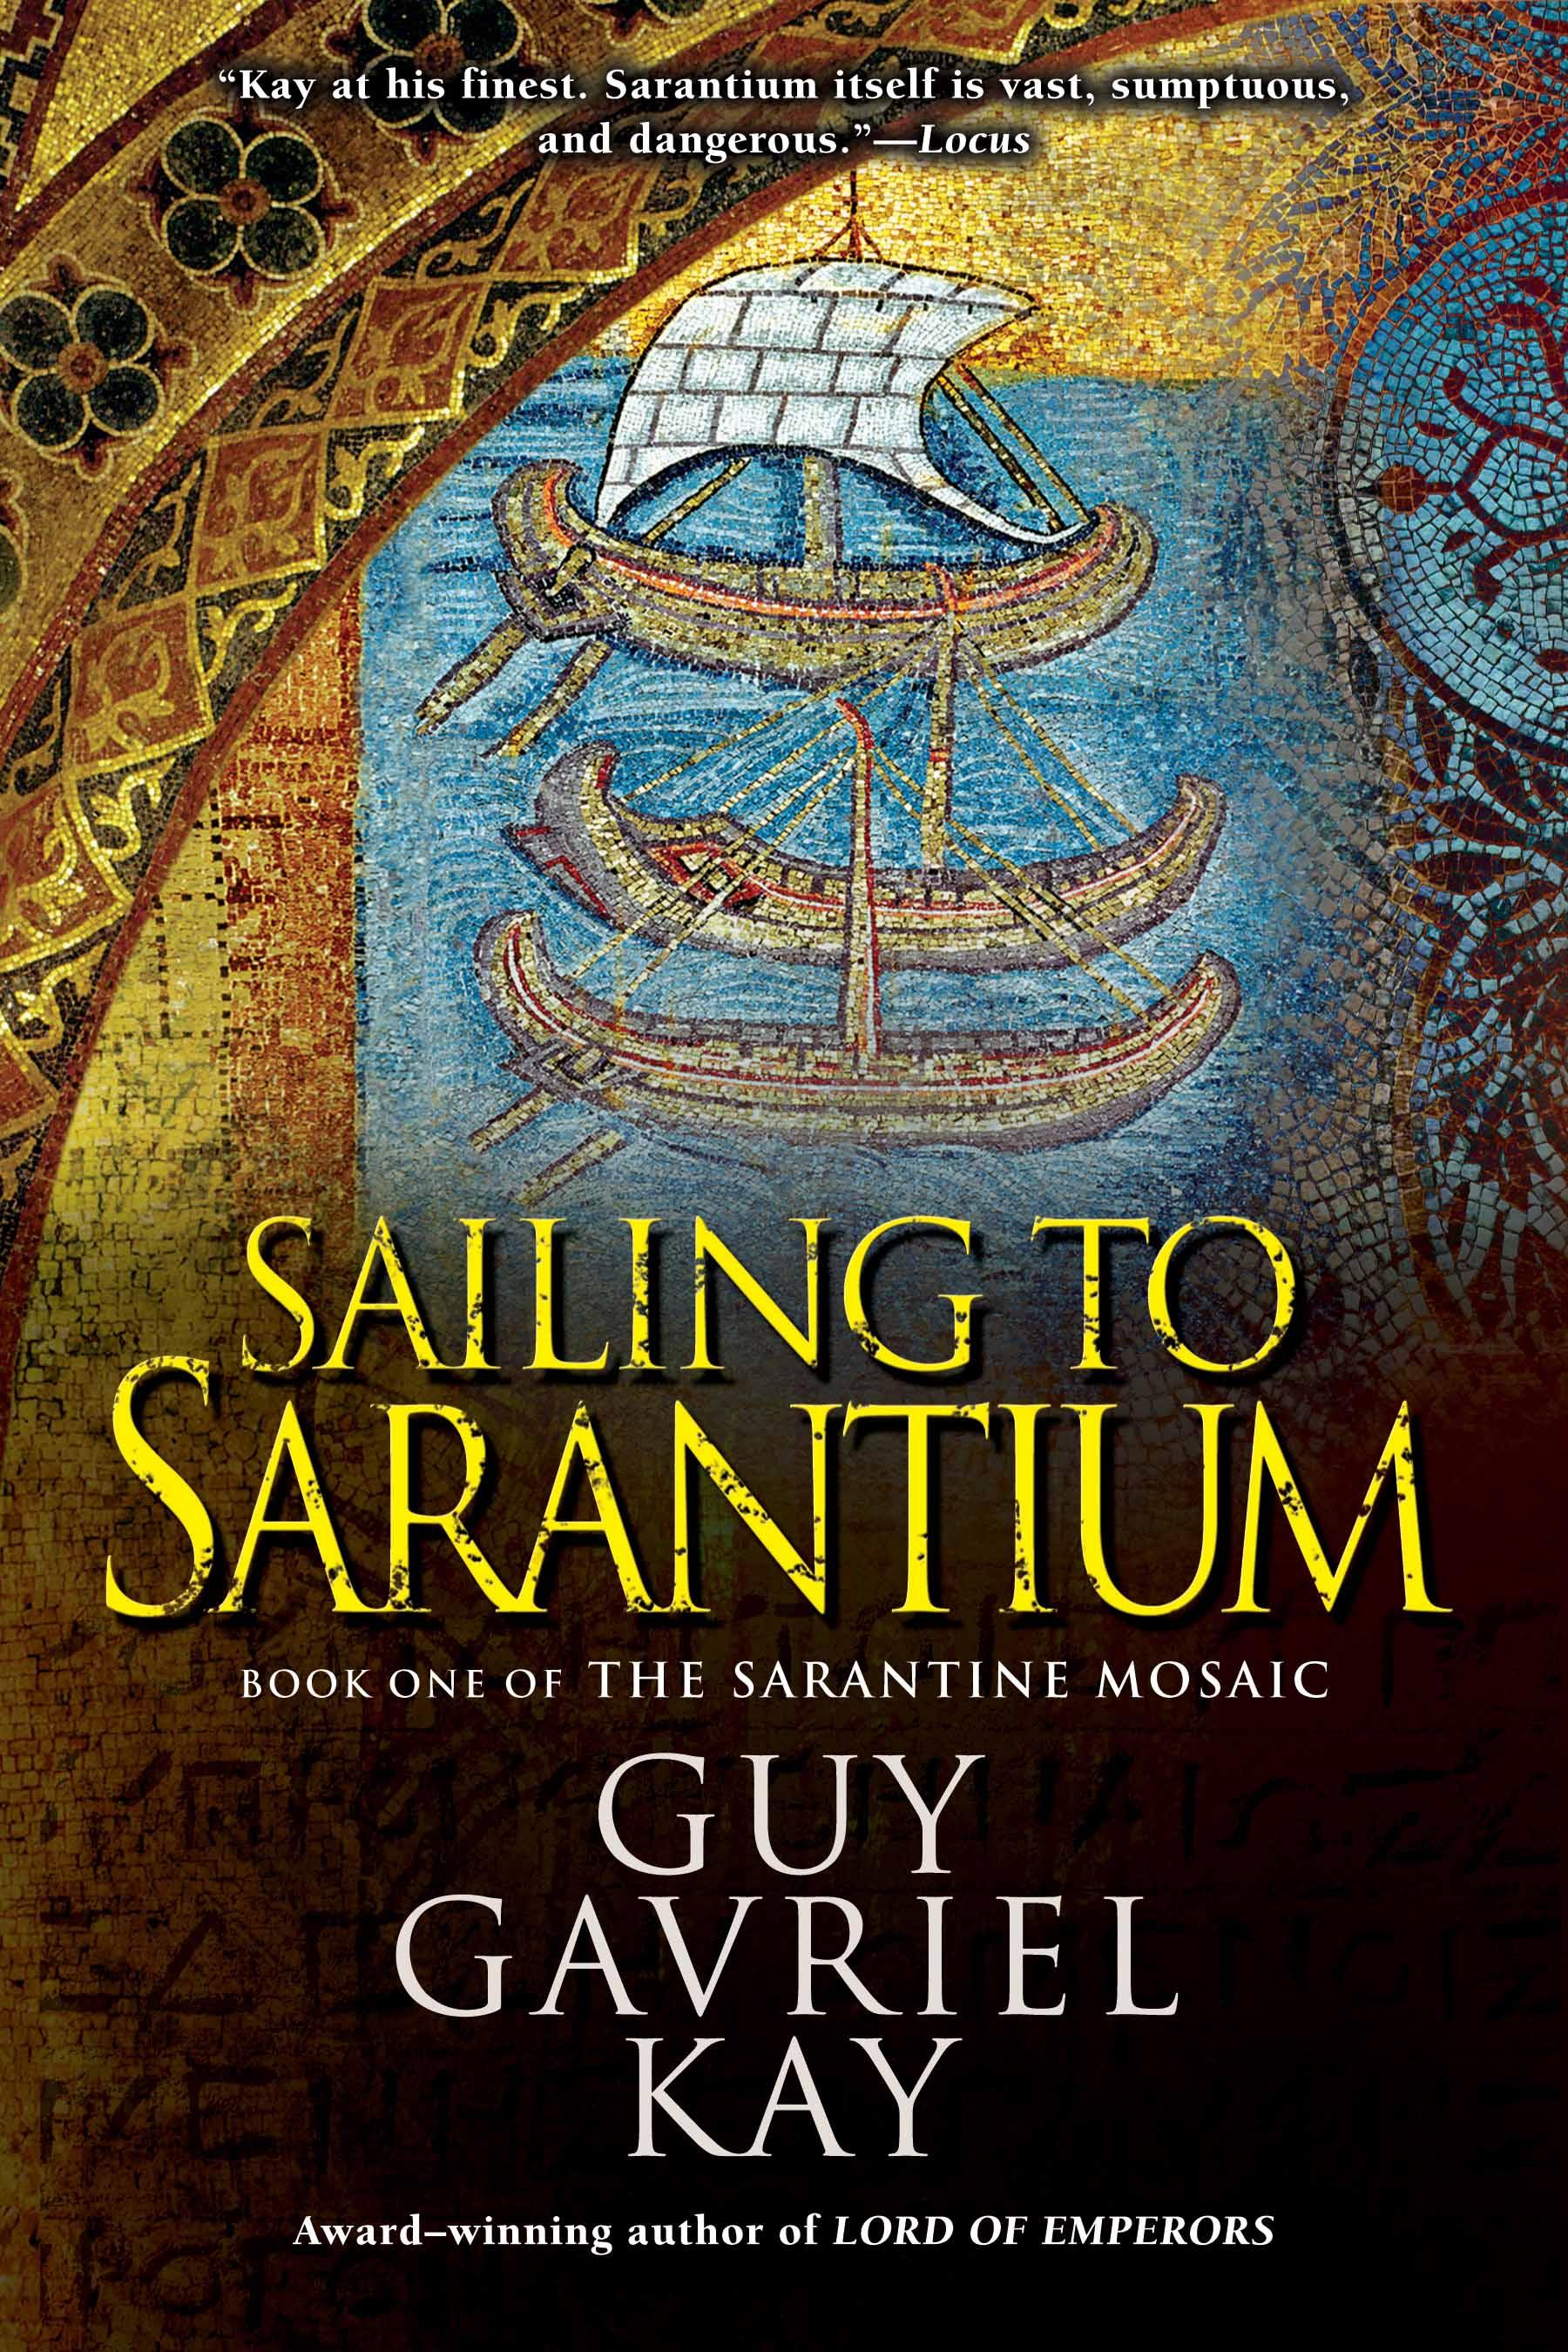 New US edition of Sailing to Sarantium